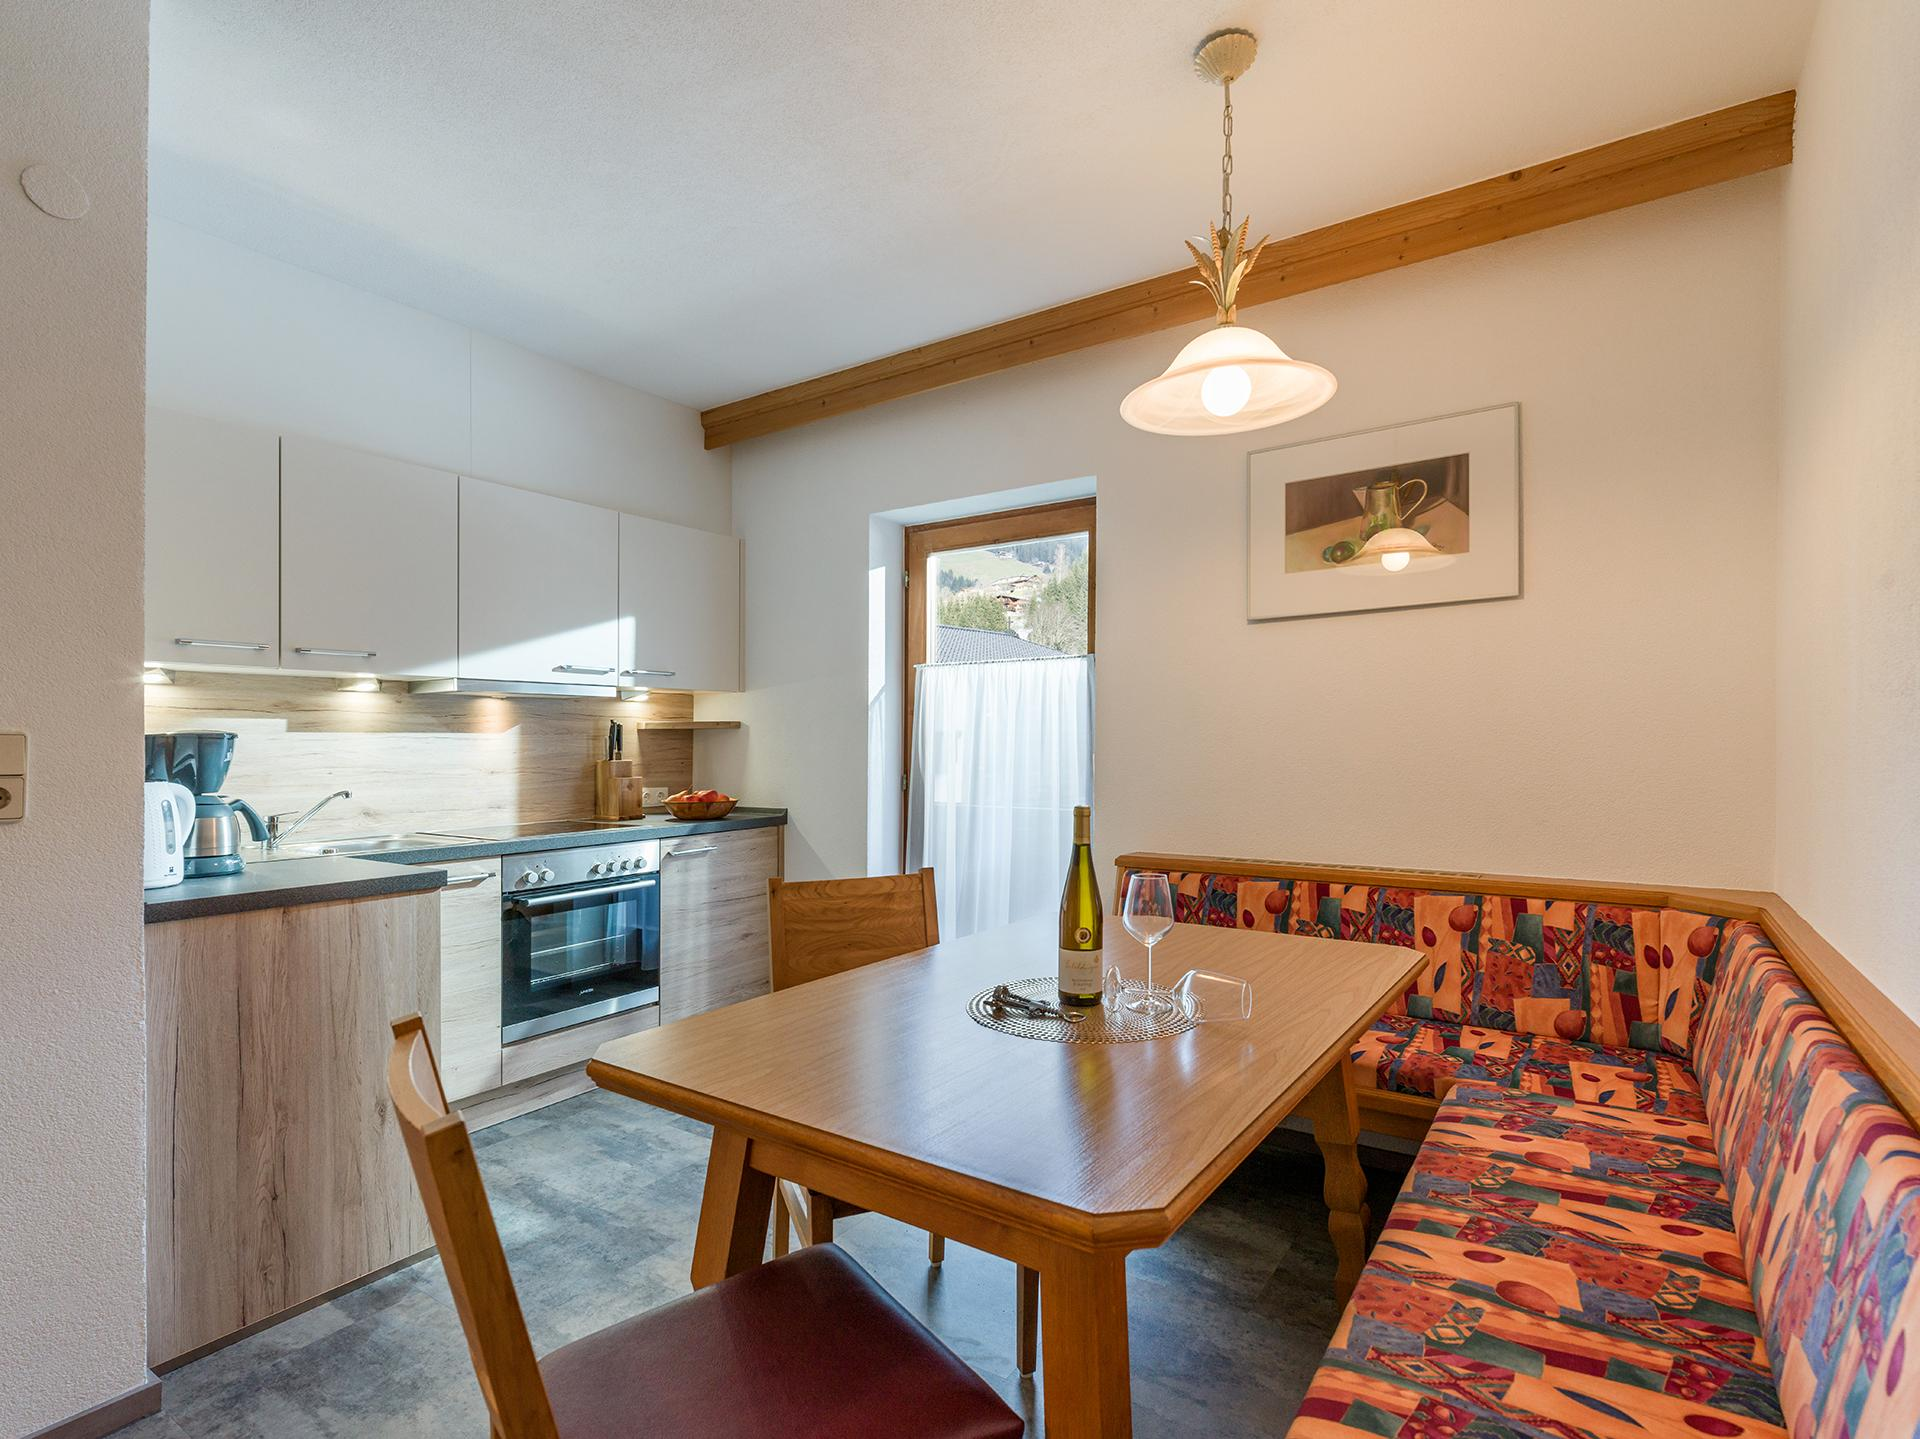 Appartement 1 (61m²)